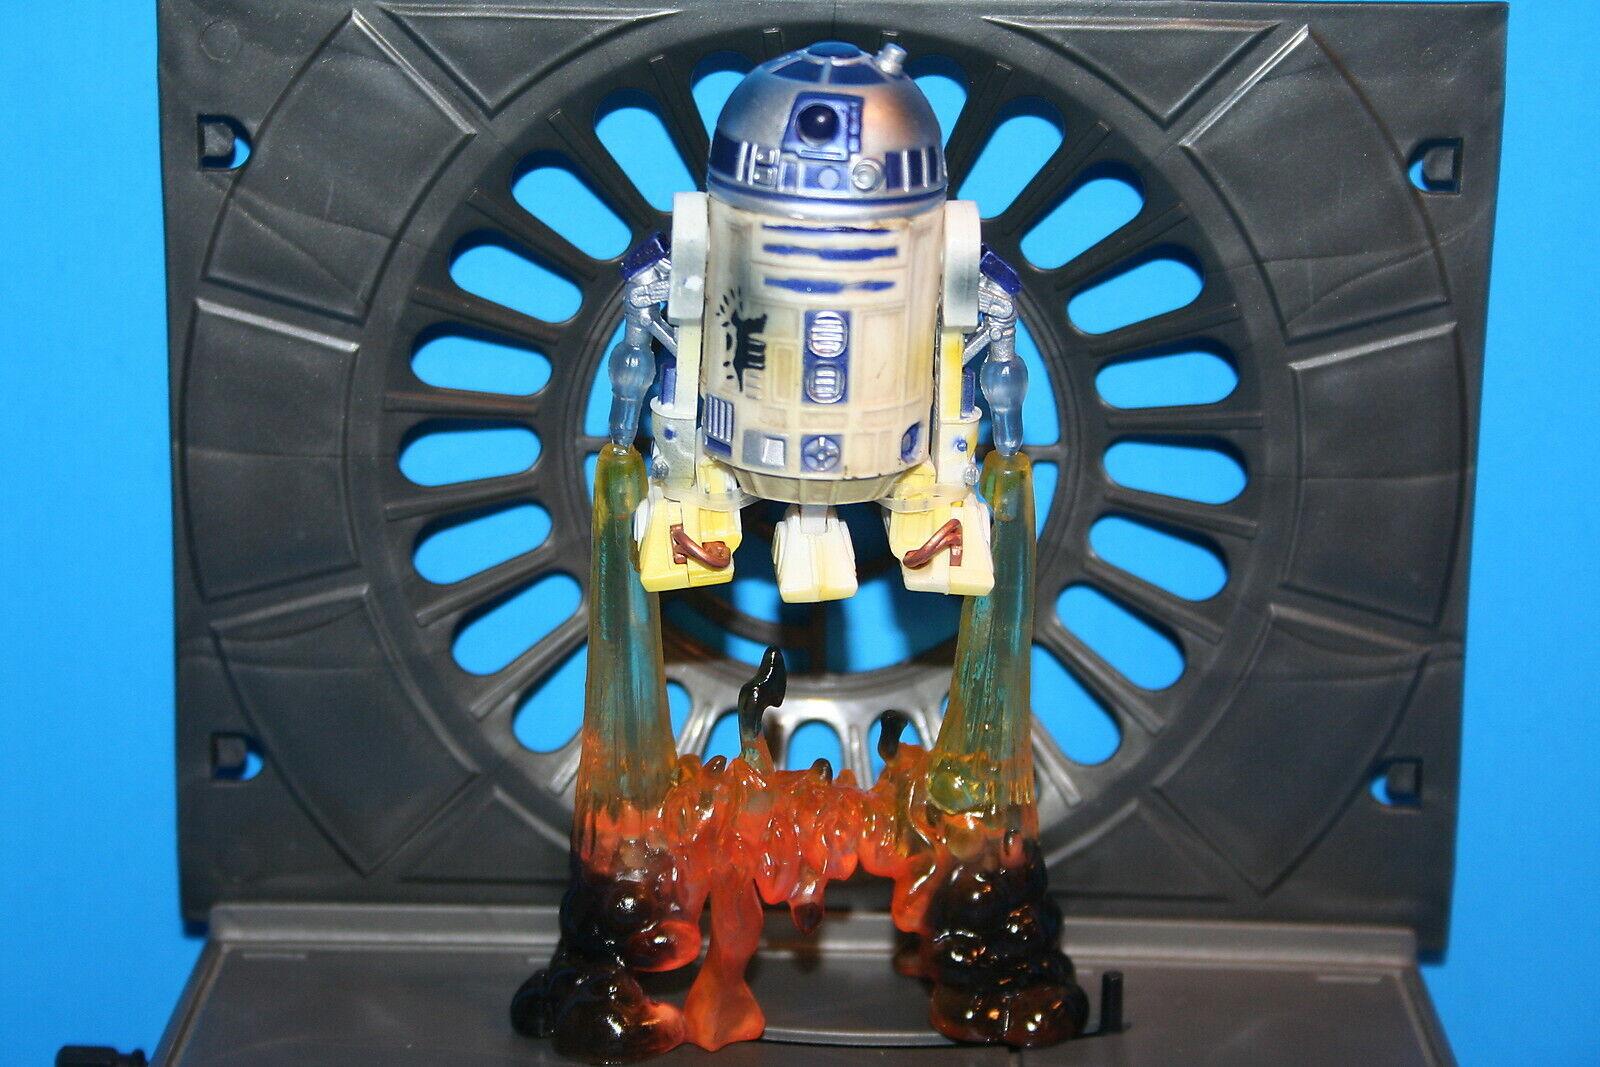 STAR WARS 07 TAC R2-D2 ROCKET STR8 FROM PACK FIGURE COMPLETE LS WEAPON HASBRO